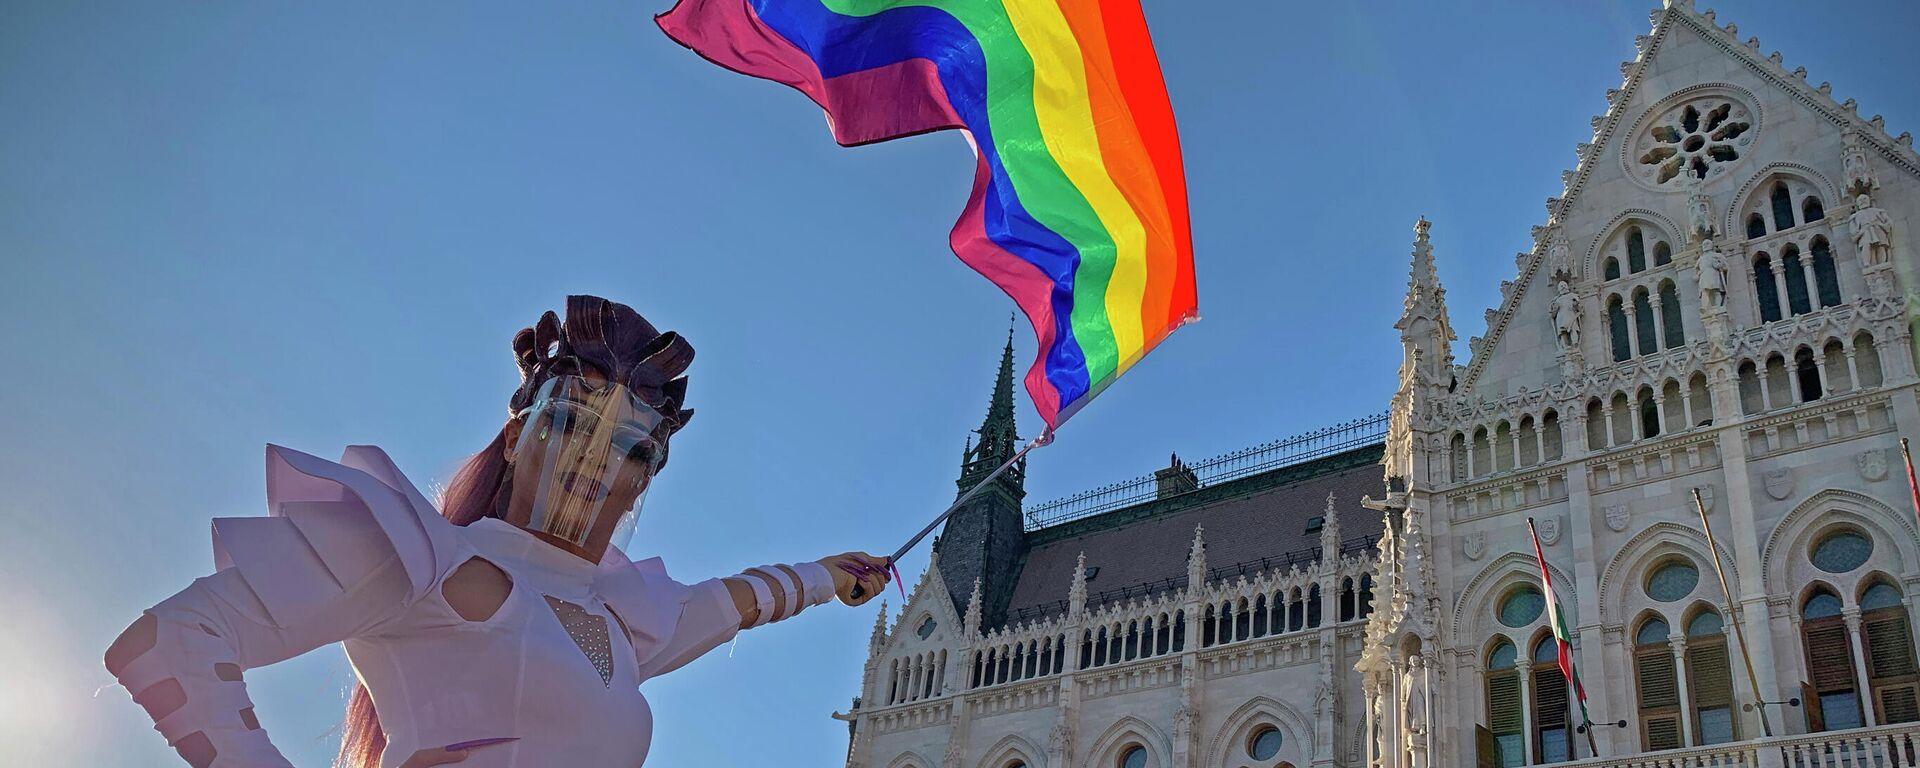 ЛГБТ активисти испред мађарског парламента - Sputnik Србија, 1920, 17.09.2021